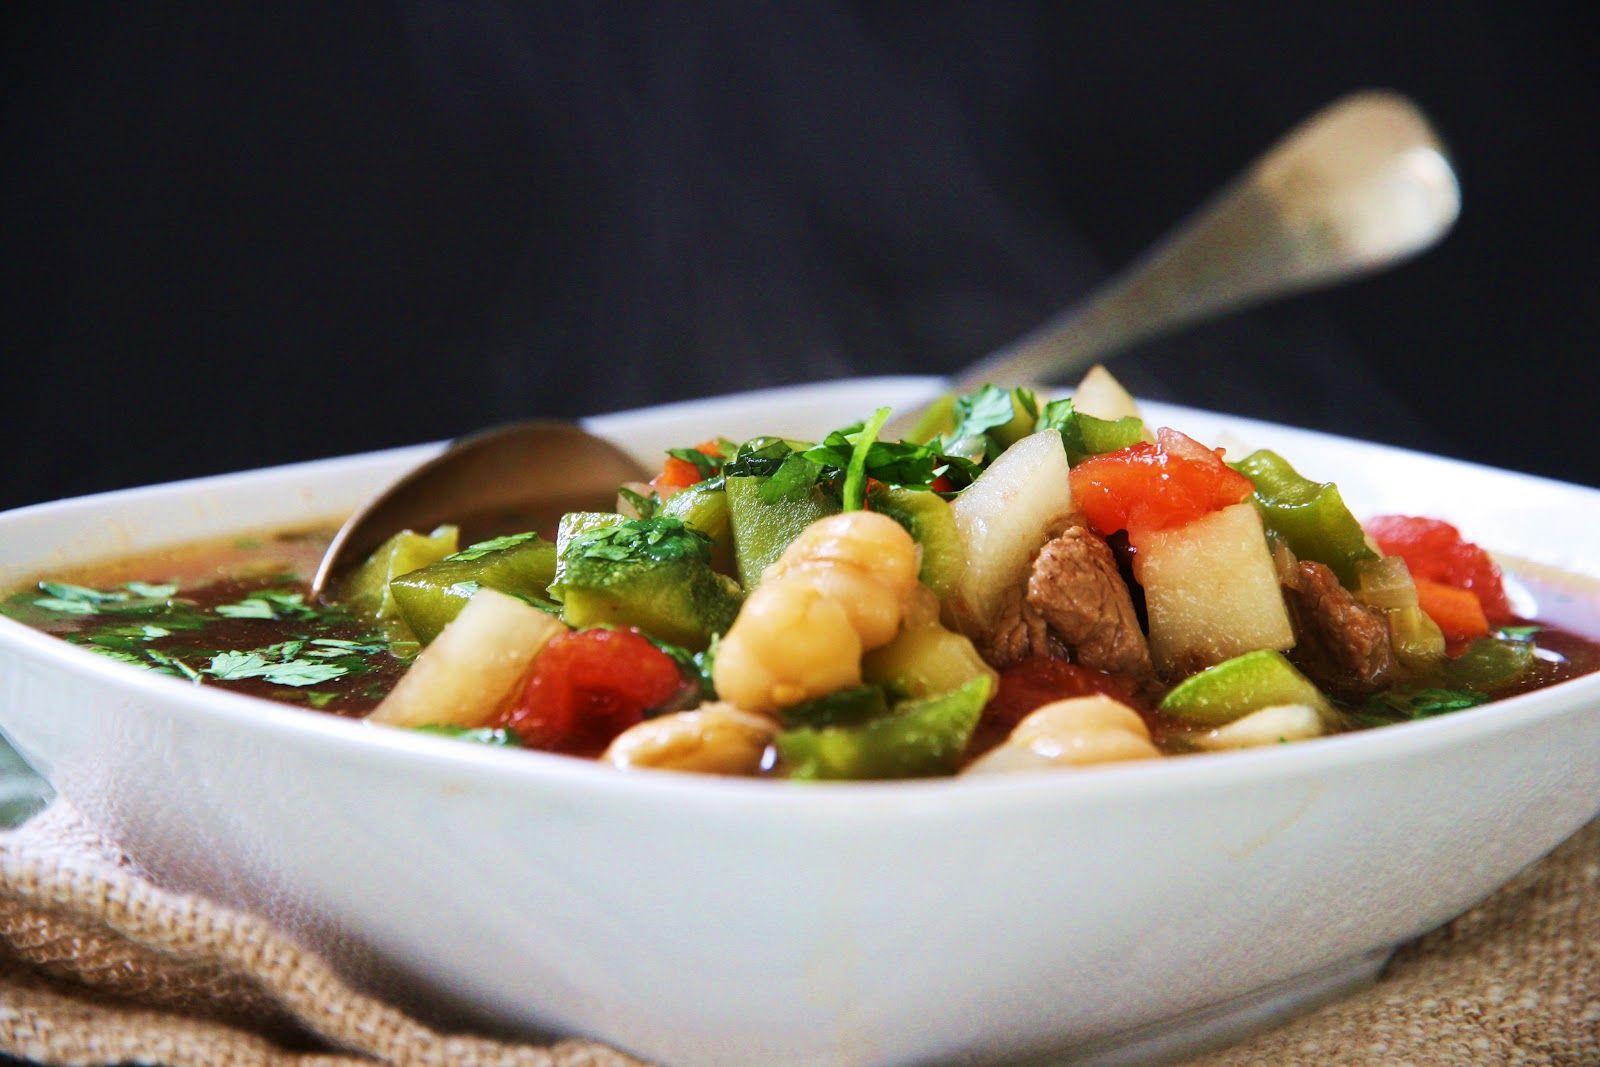 рецепт супа харчо из баранины шурпа